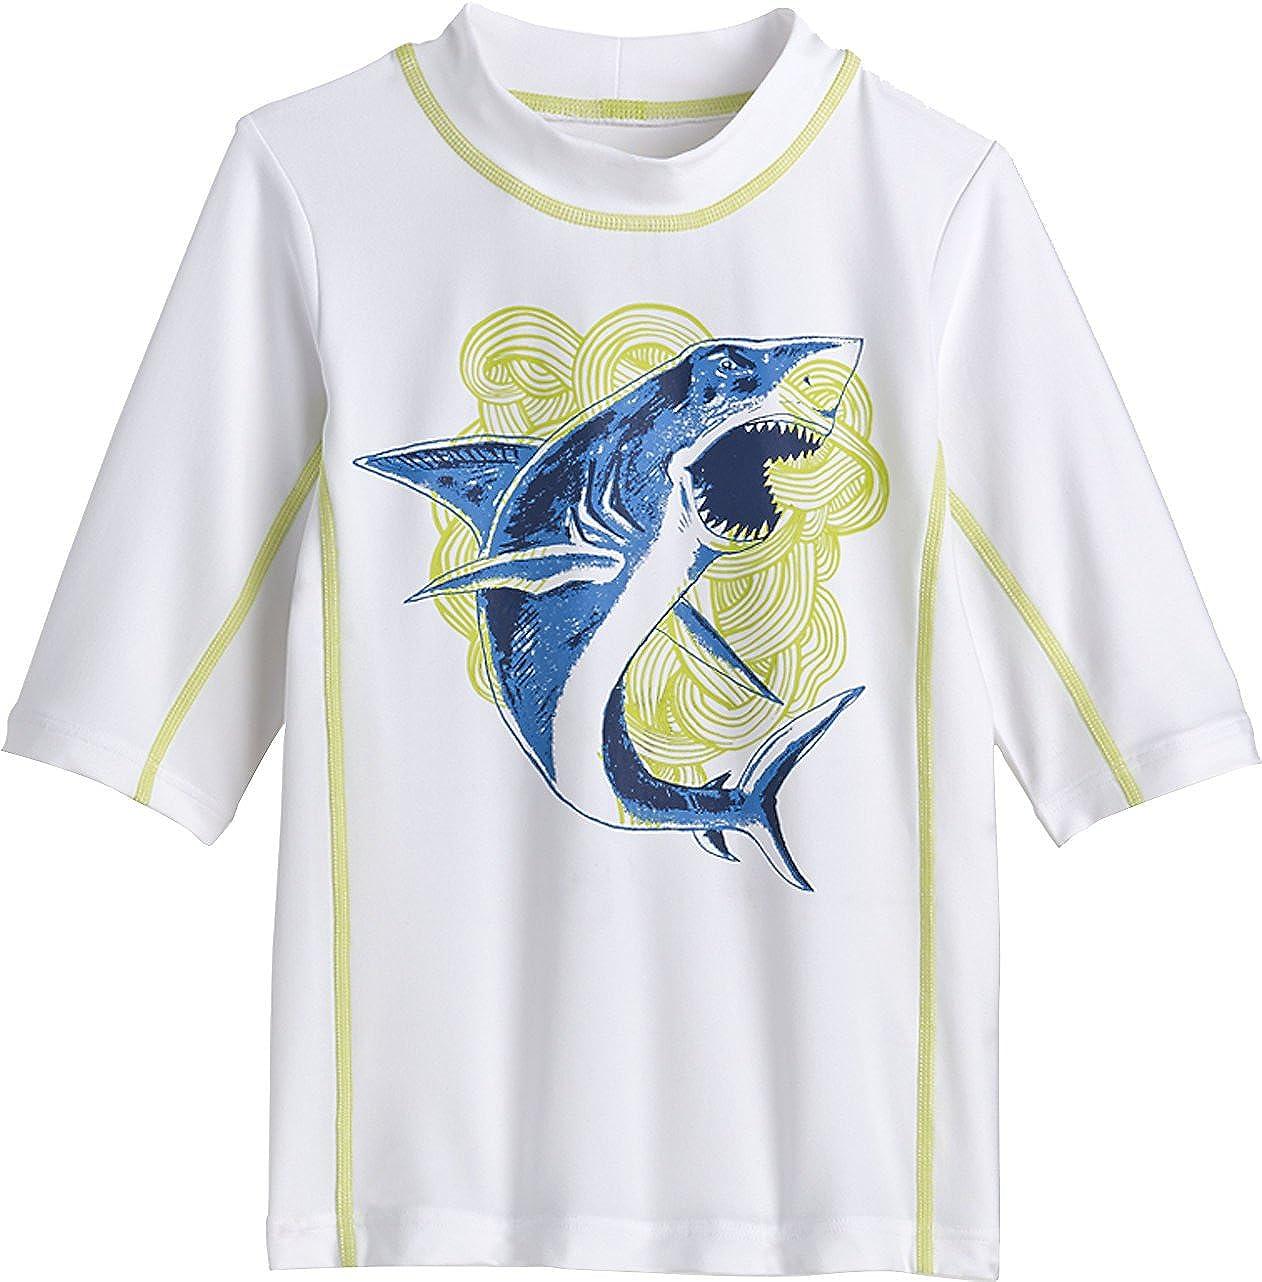 Coolibar UPF 50+ Kids' Surf Shirt - Sun Protective